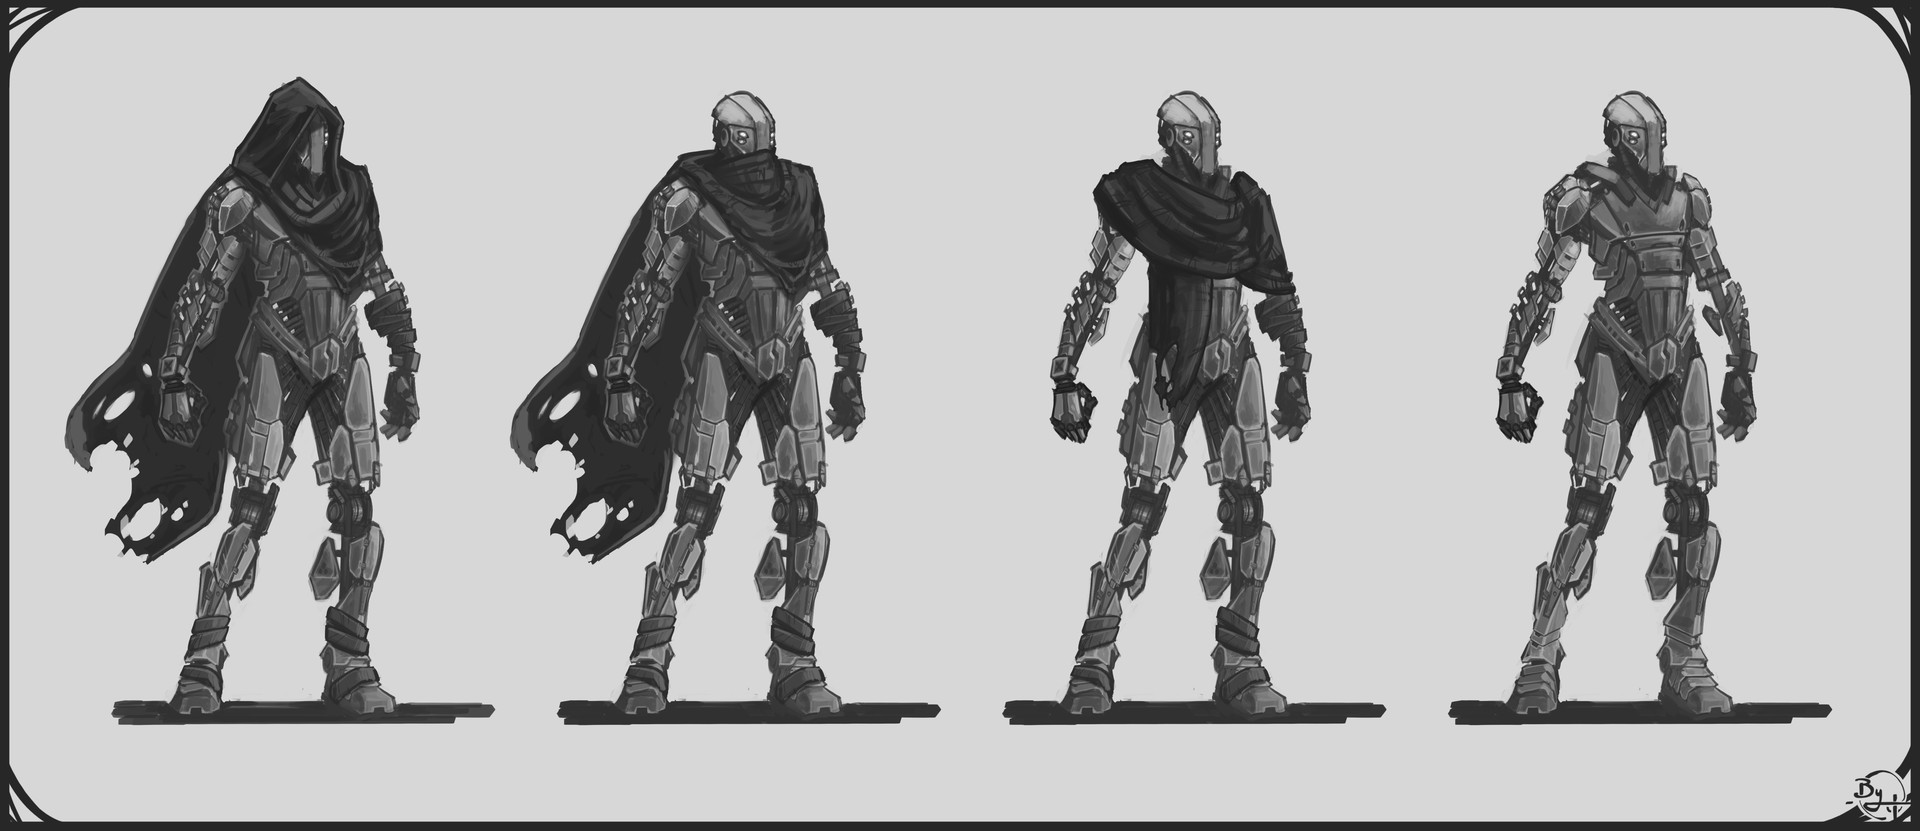 Etienne beschet conceptart stealth v1